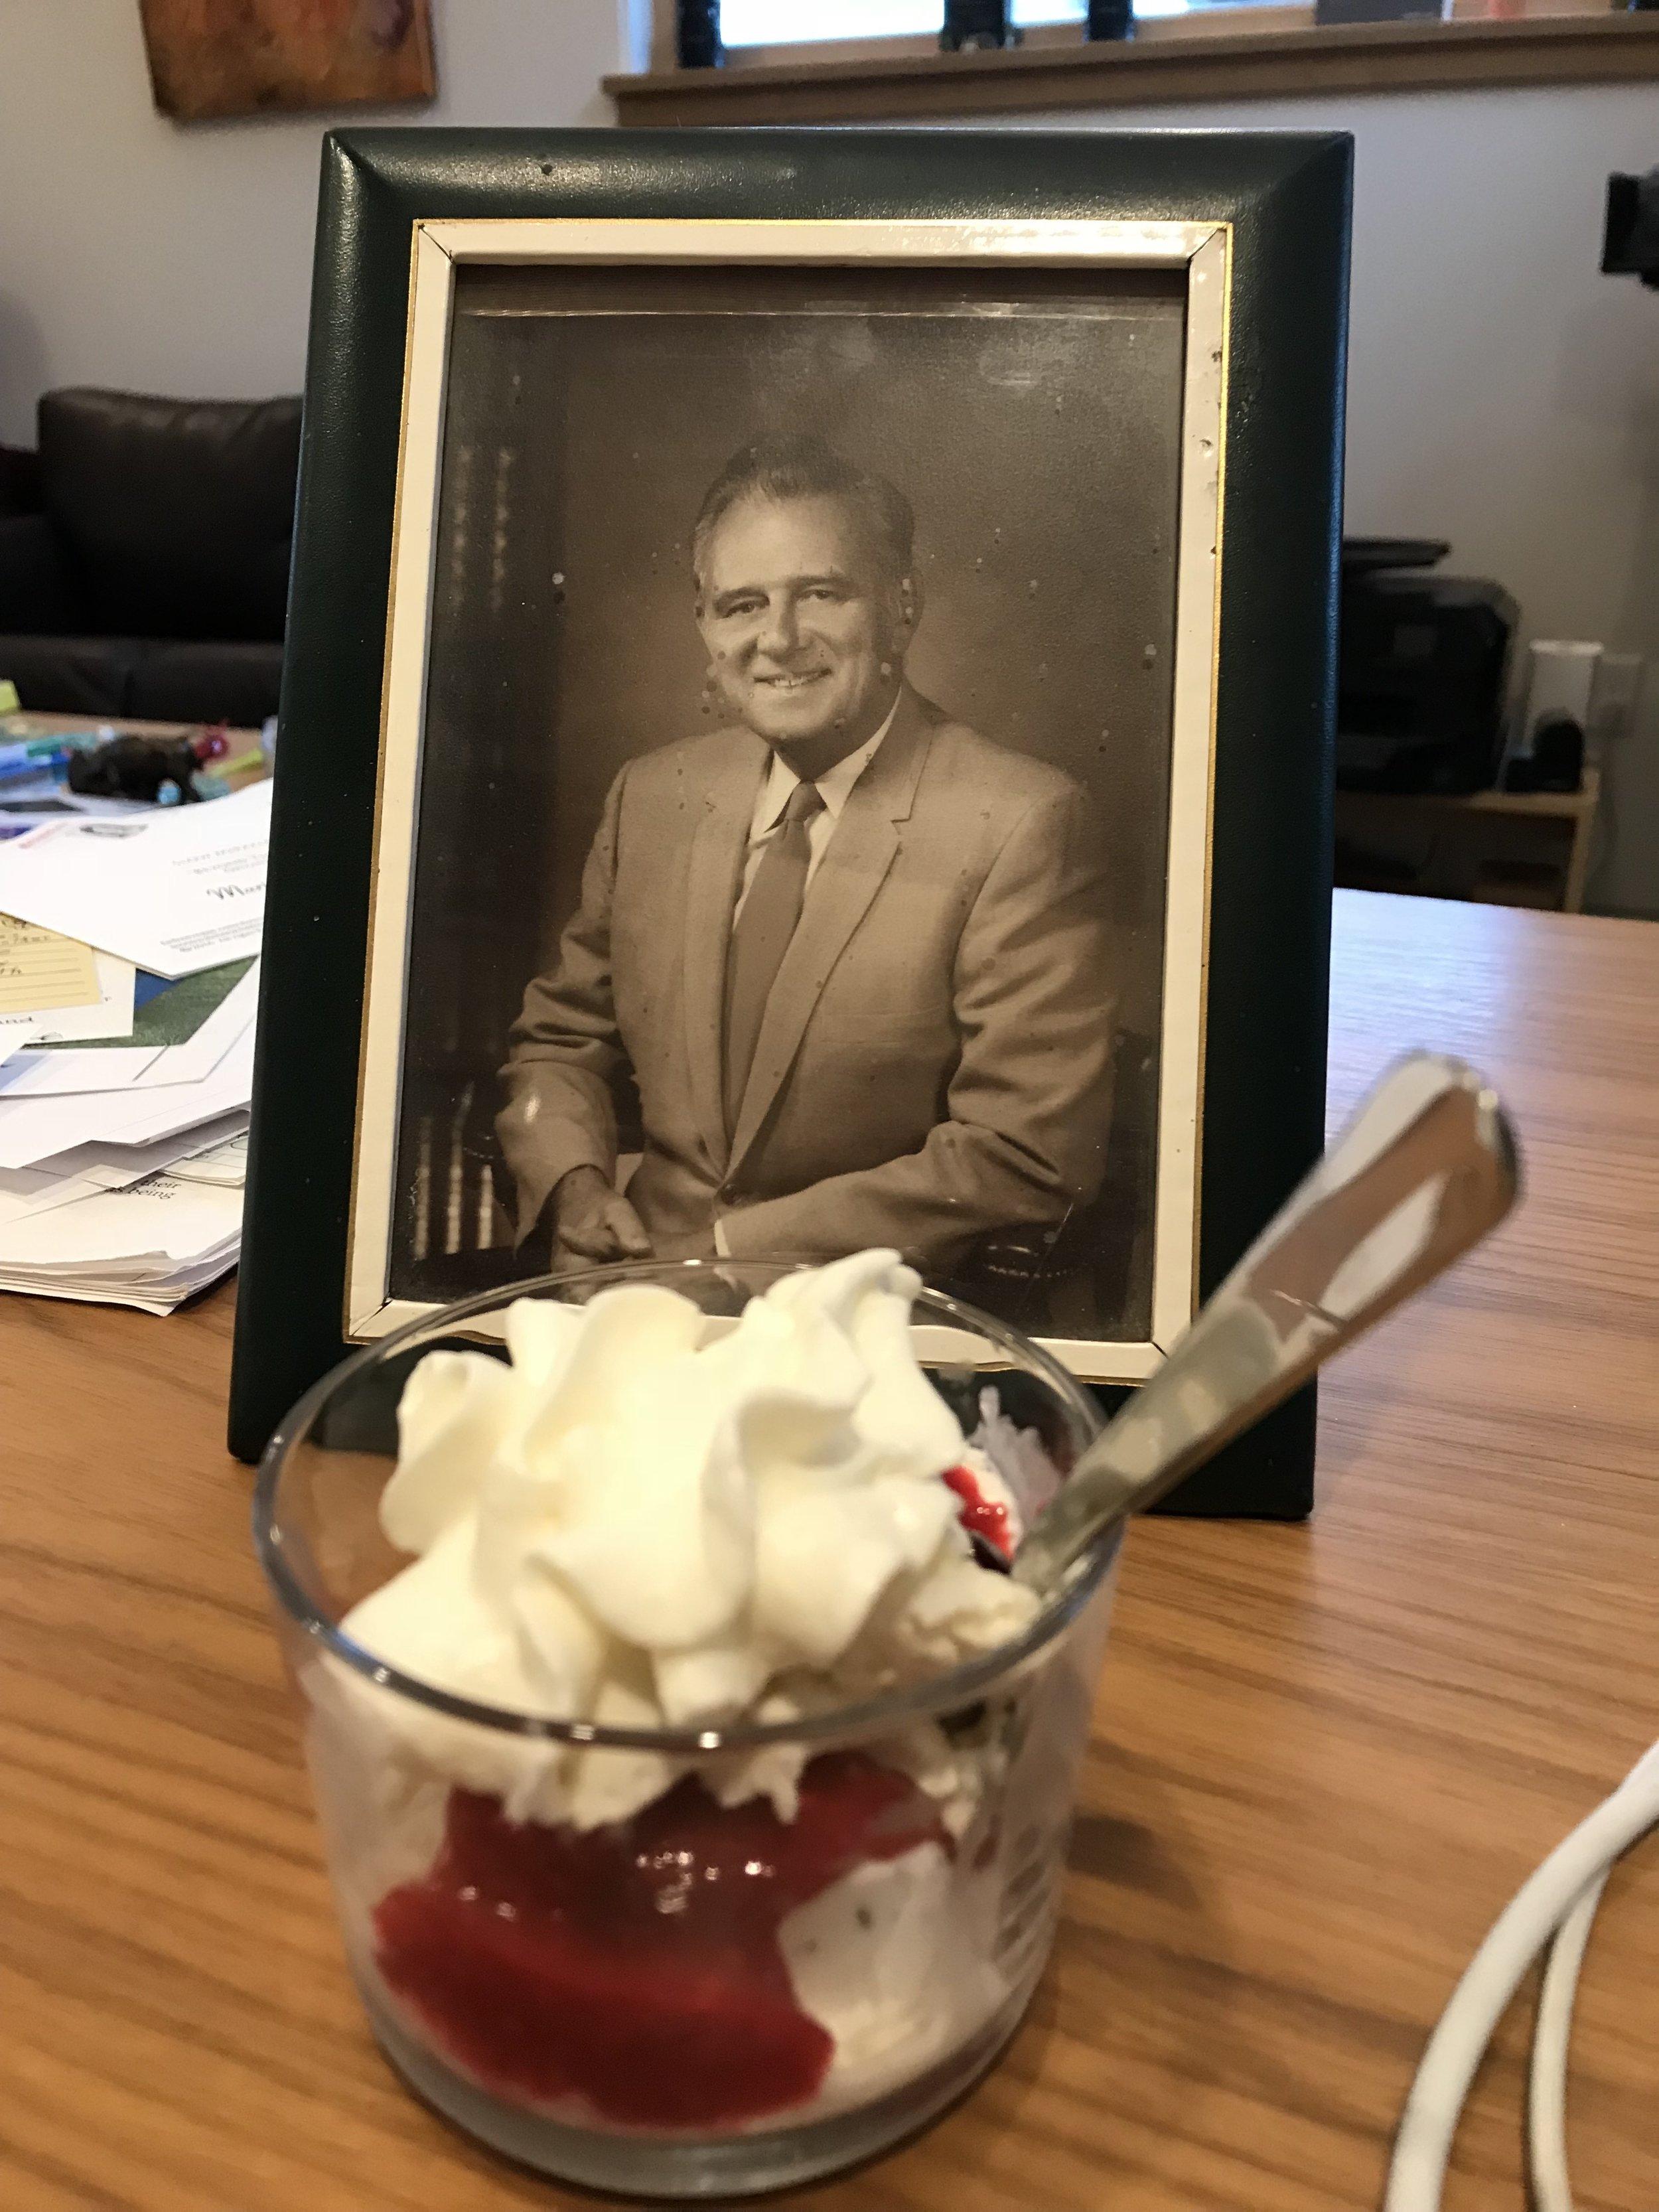 Breyer's Vanilla Ice Cream with freshly made raspberry sauce and Reddi Whip